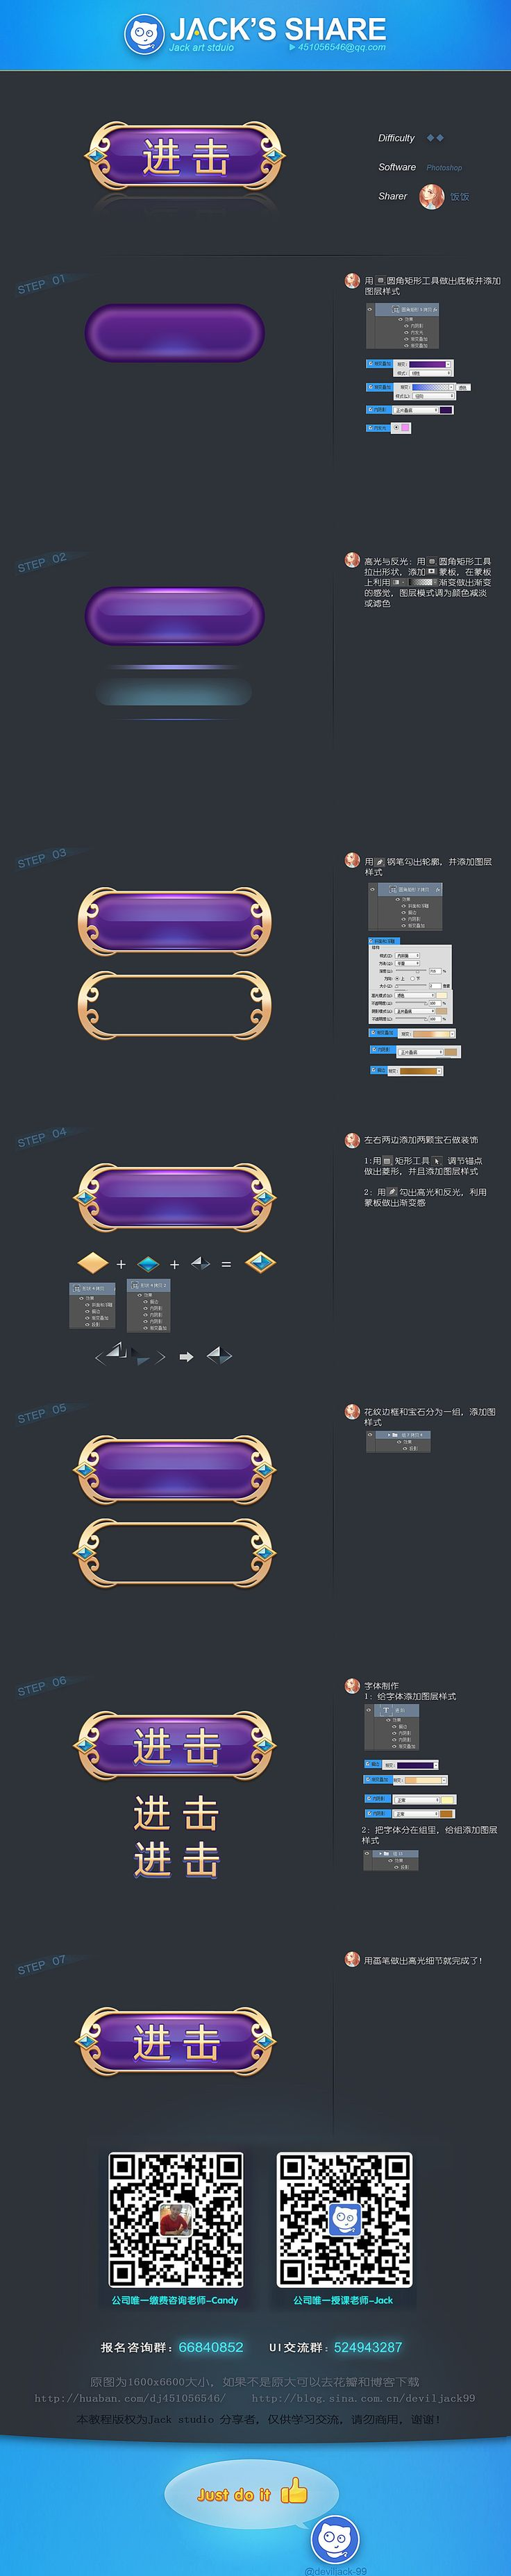 Jack game UI classmates works (interface, icons, game ui, u